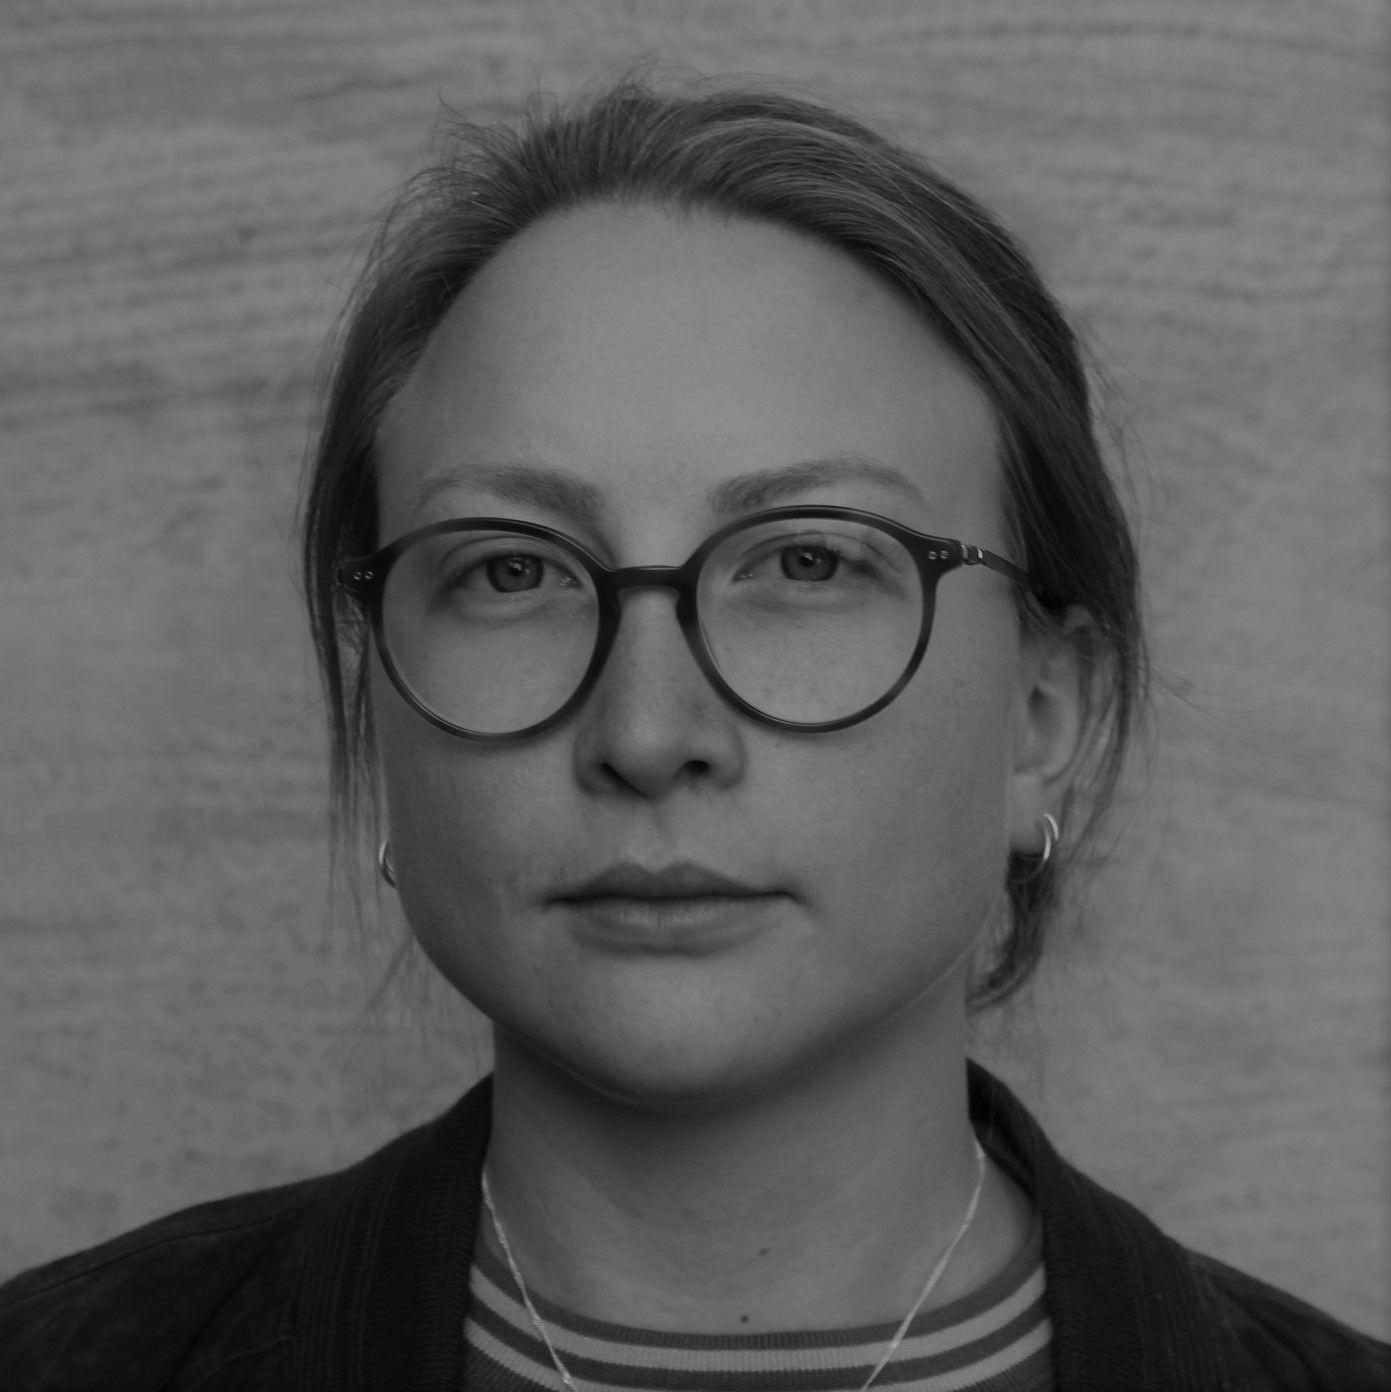 Eline Aresdatter Haakestad